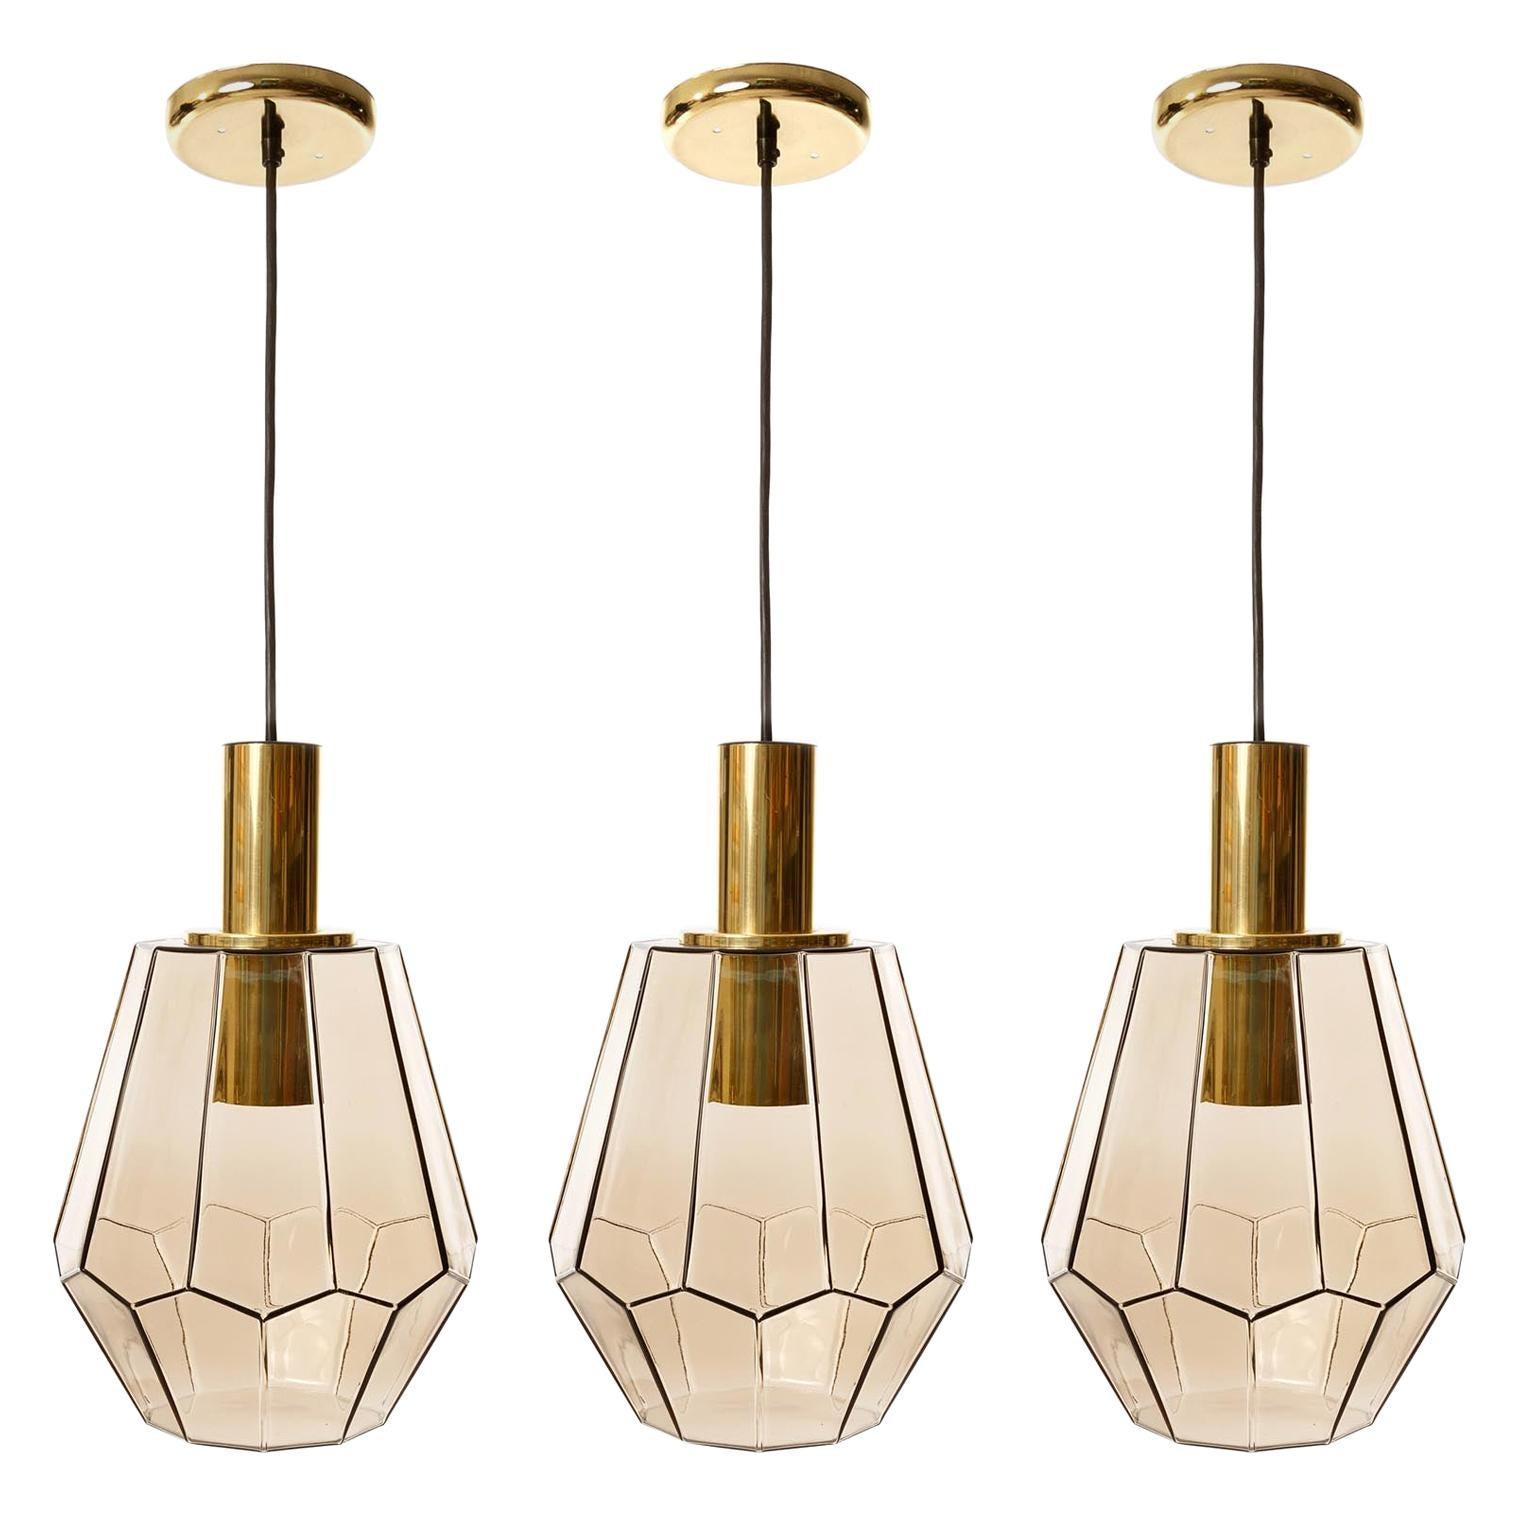 Set of Three Limburg Pendant Lights, Brass and Amber Smoked Glass, 1970s